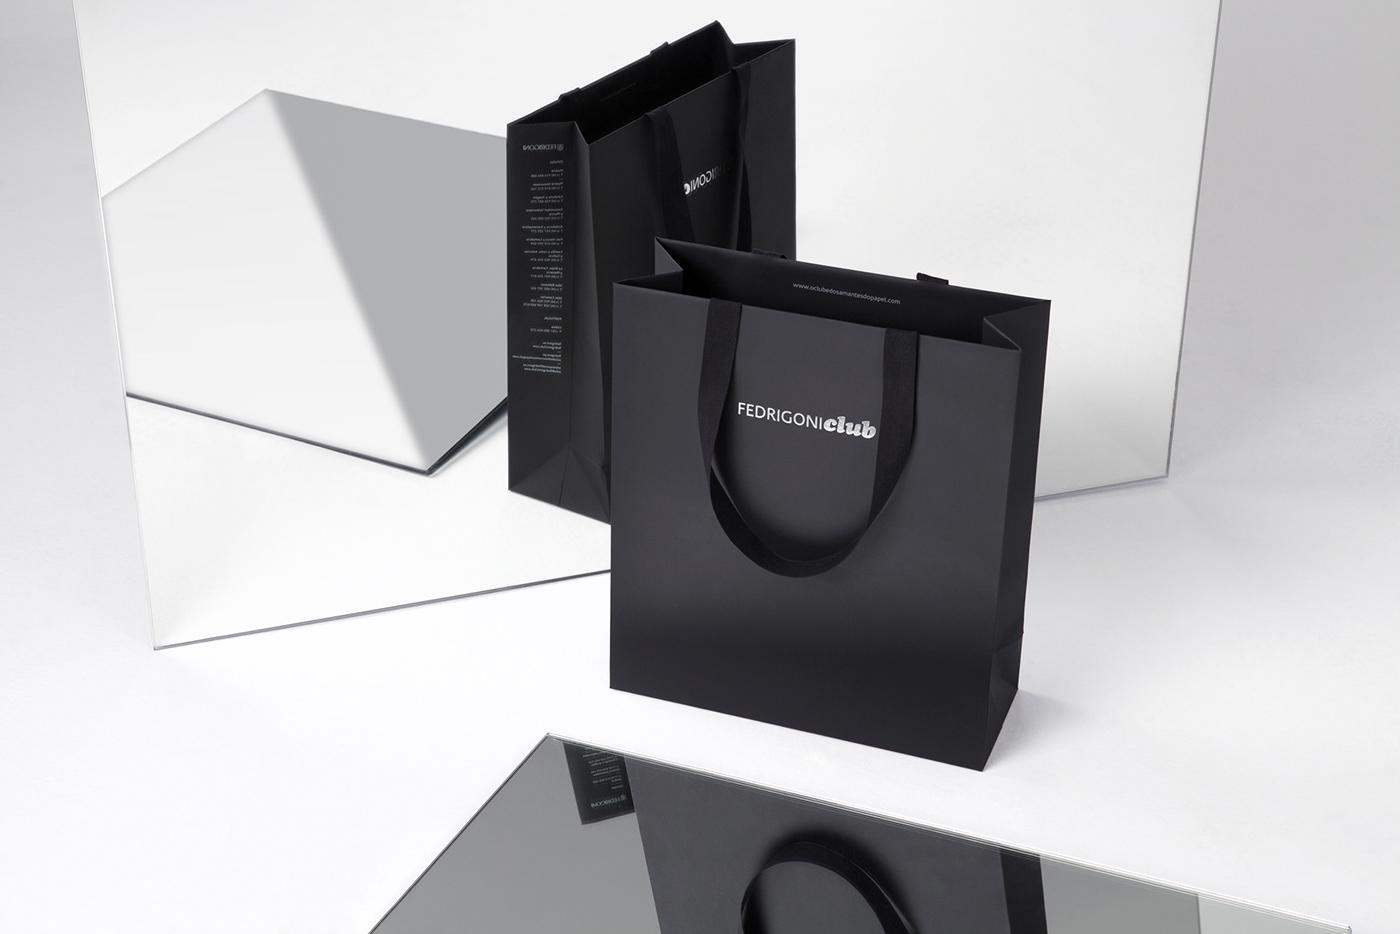 visual identity Logotype stationary bag merchandising Web Design  ux logo animation branding  fedrigoni